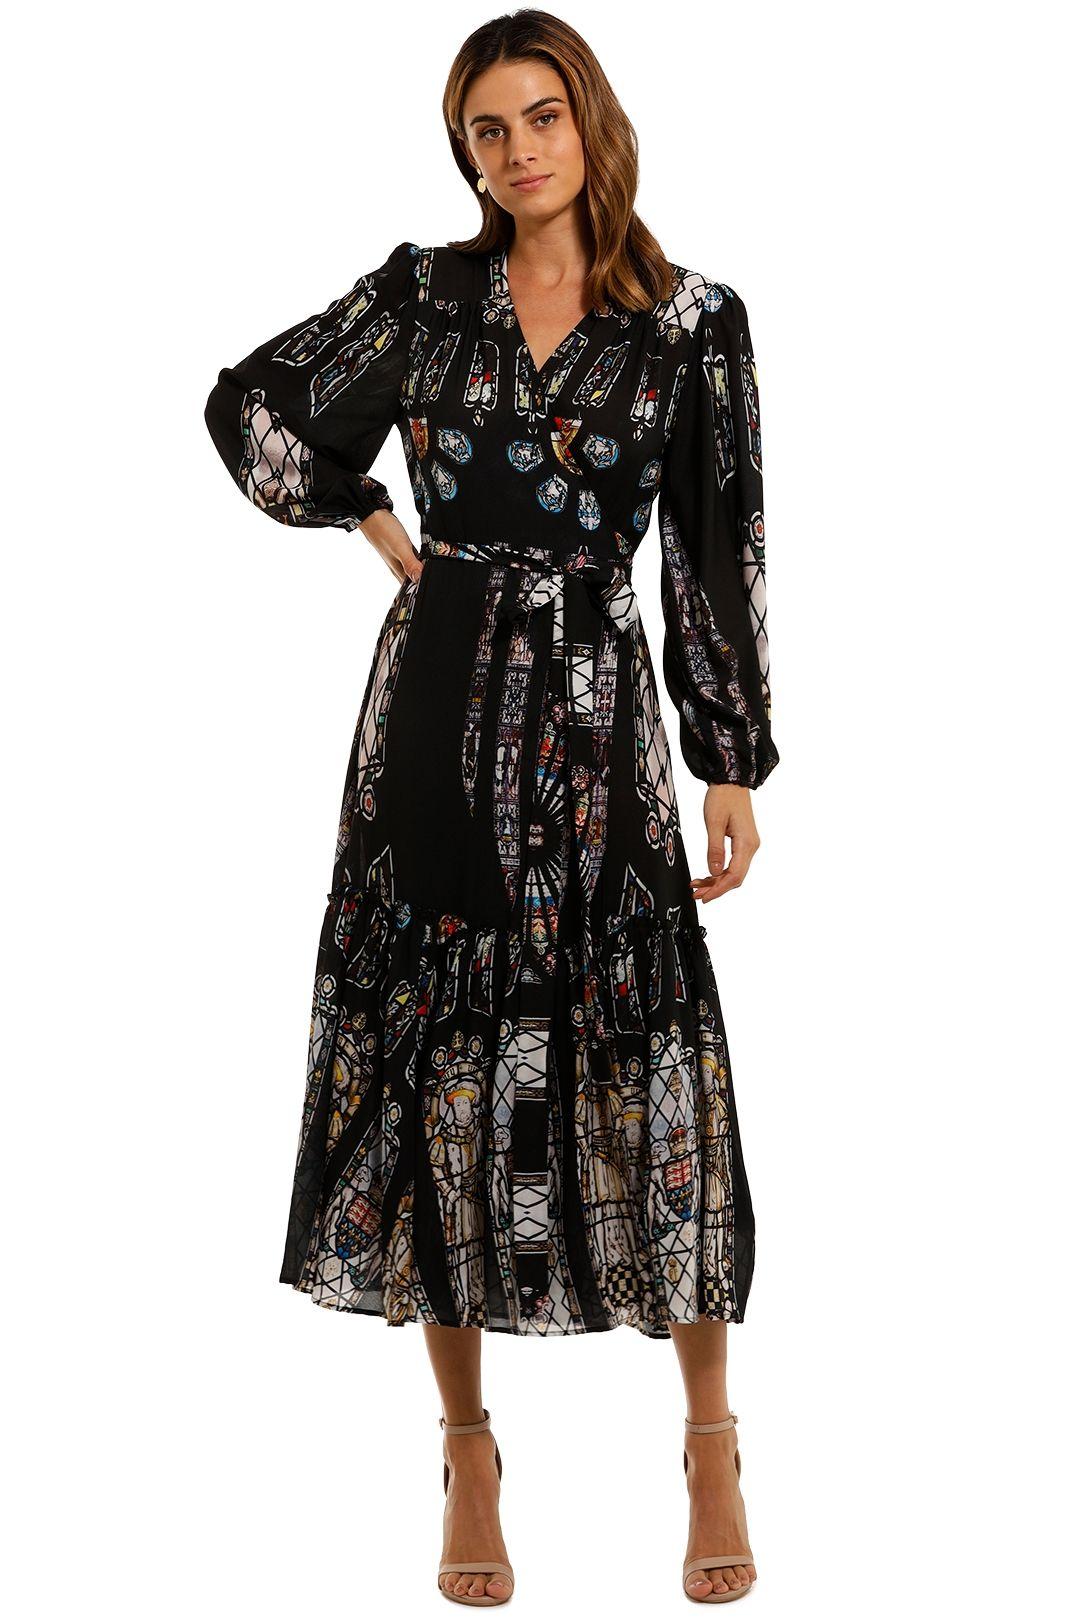 Cooper by Trelise Cooper Wrap Me Up Midi Dress print